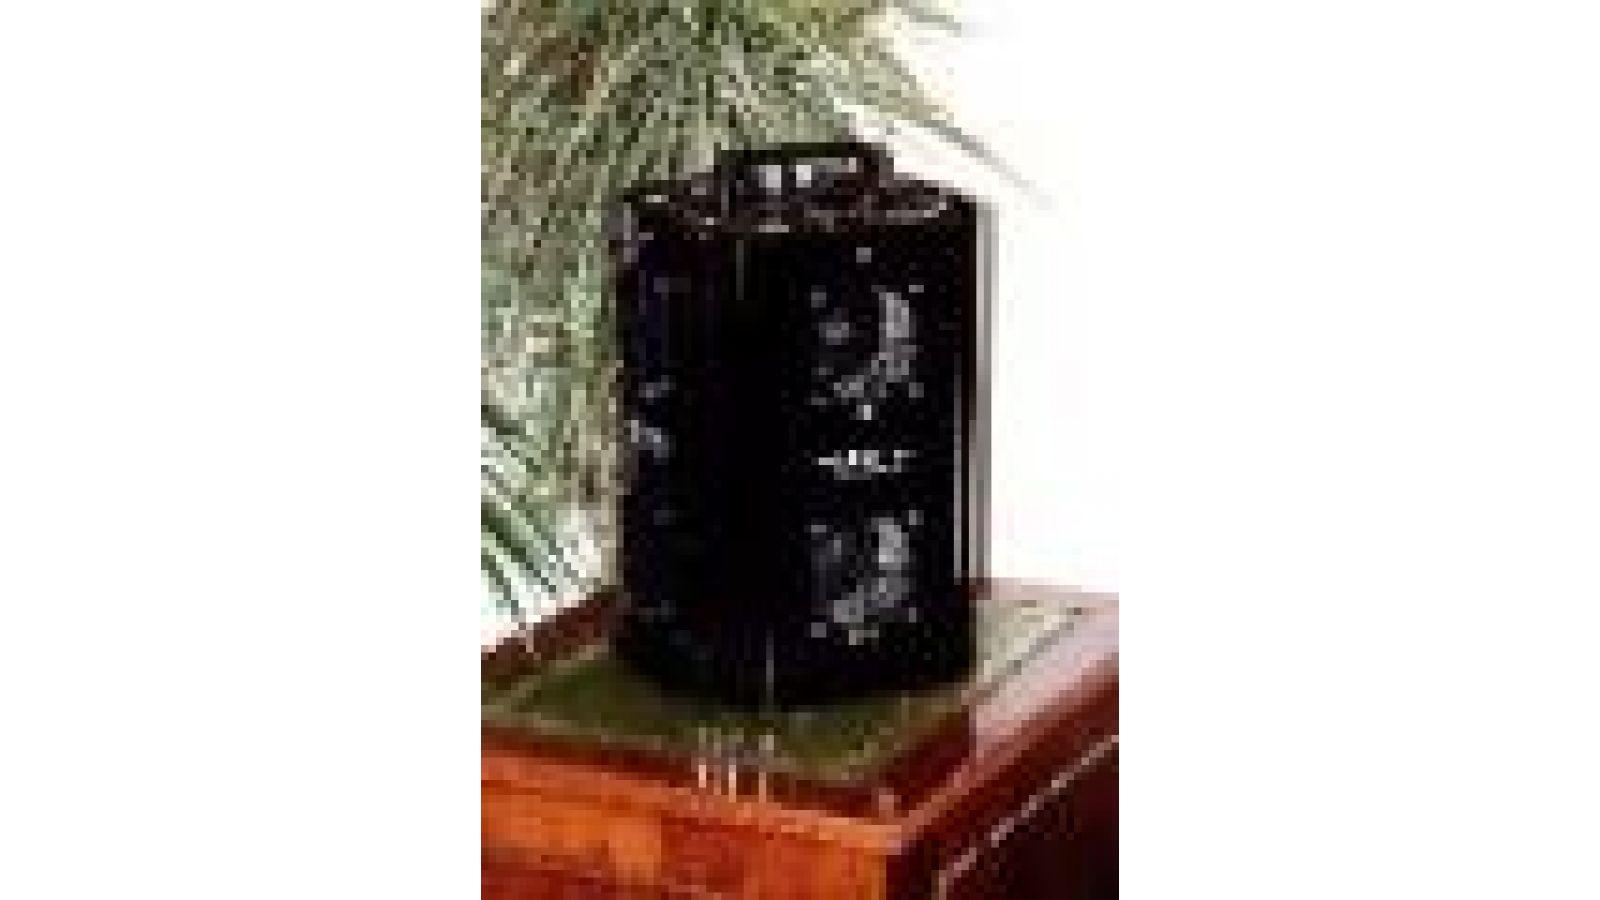 Multi-Scent 6¢â€ž¢ Single Output Fragrance Machine